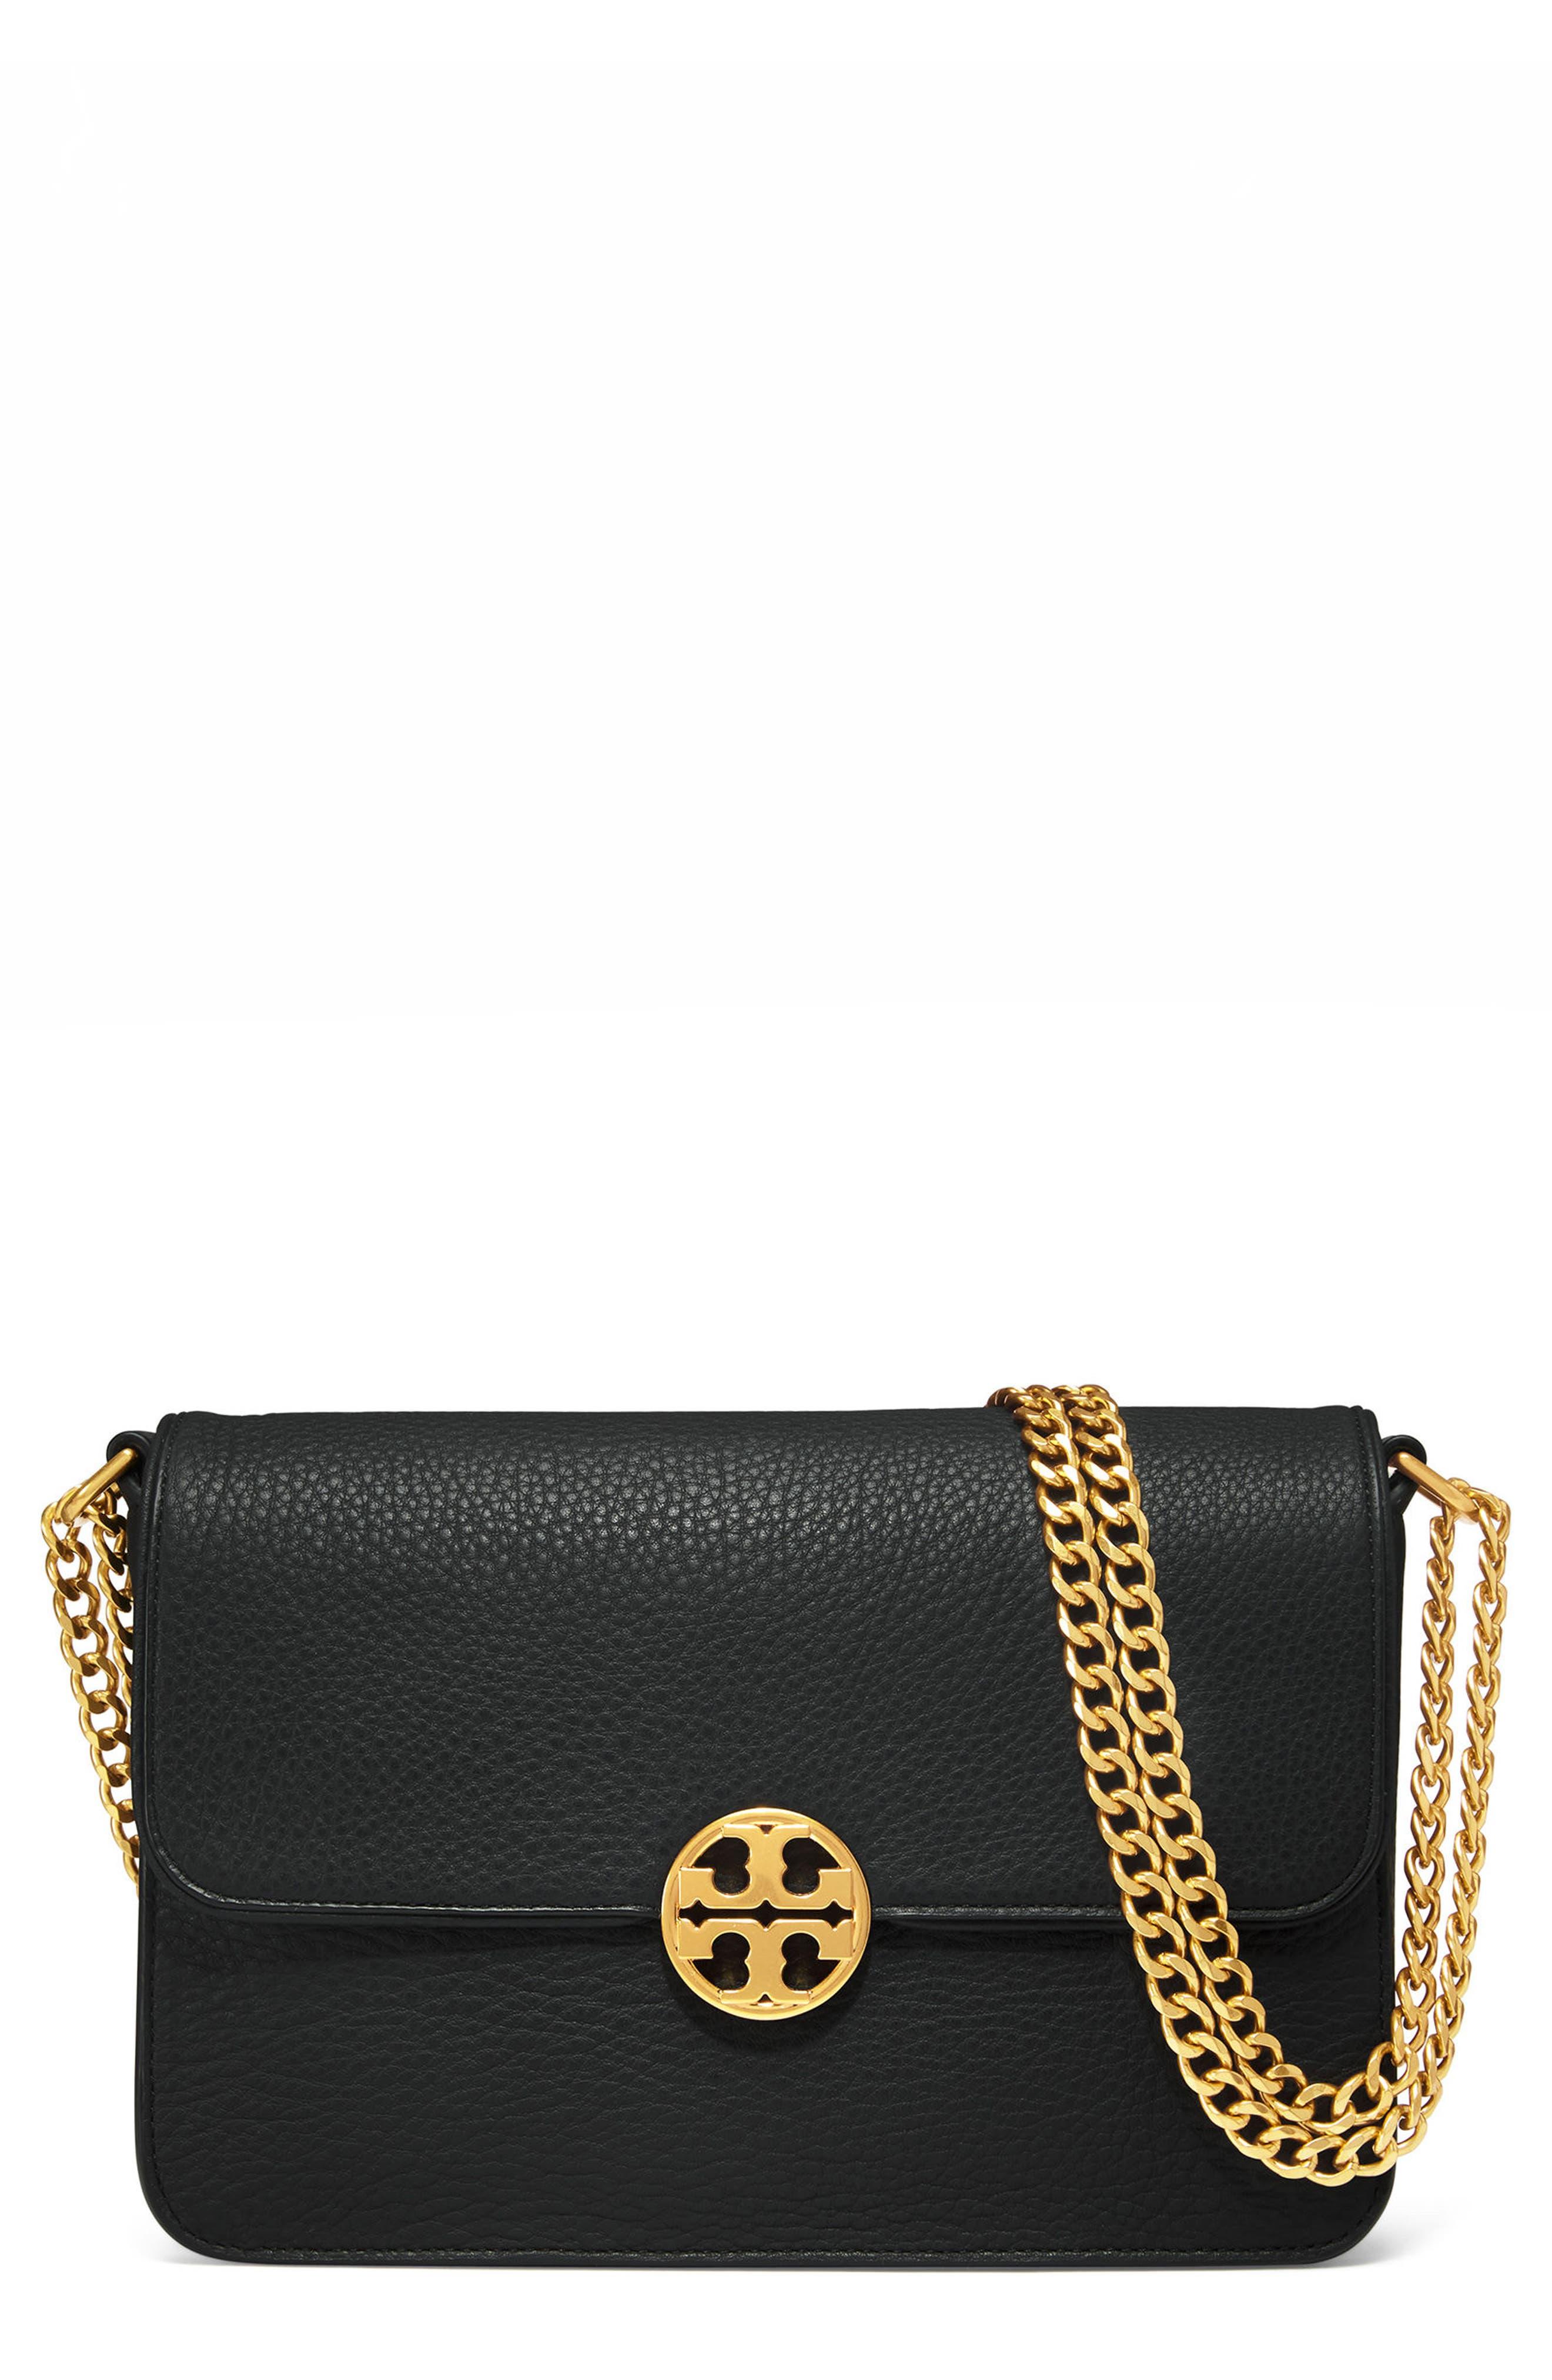 Alternate Image 1 Selected - Tory Burch Chelsea Leather Shoulder Bag